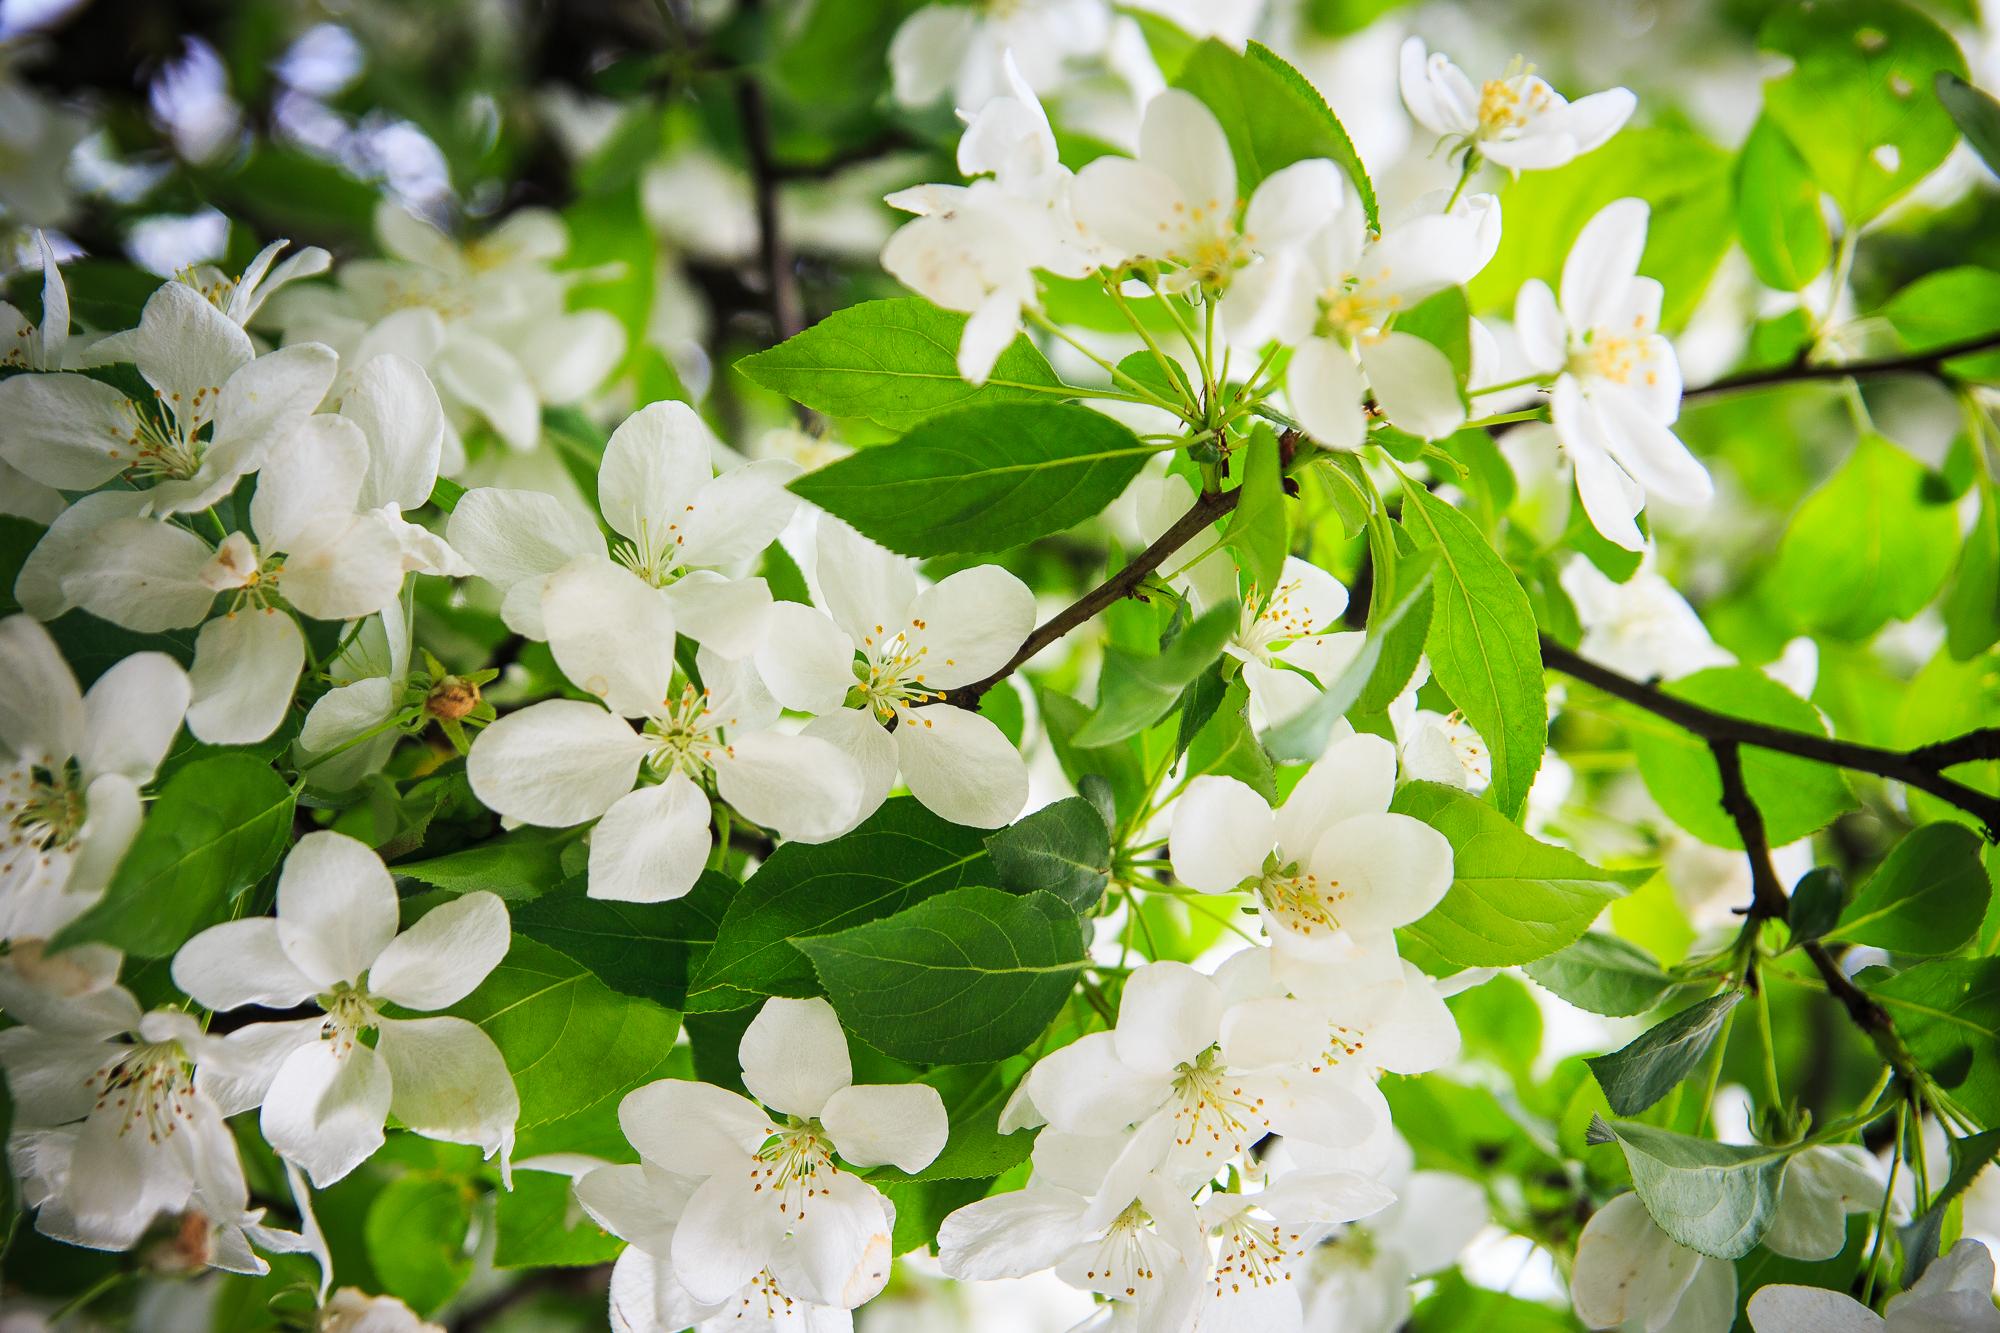 White Cherry Flowers Via @Atisgailis